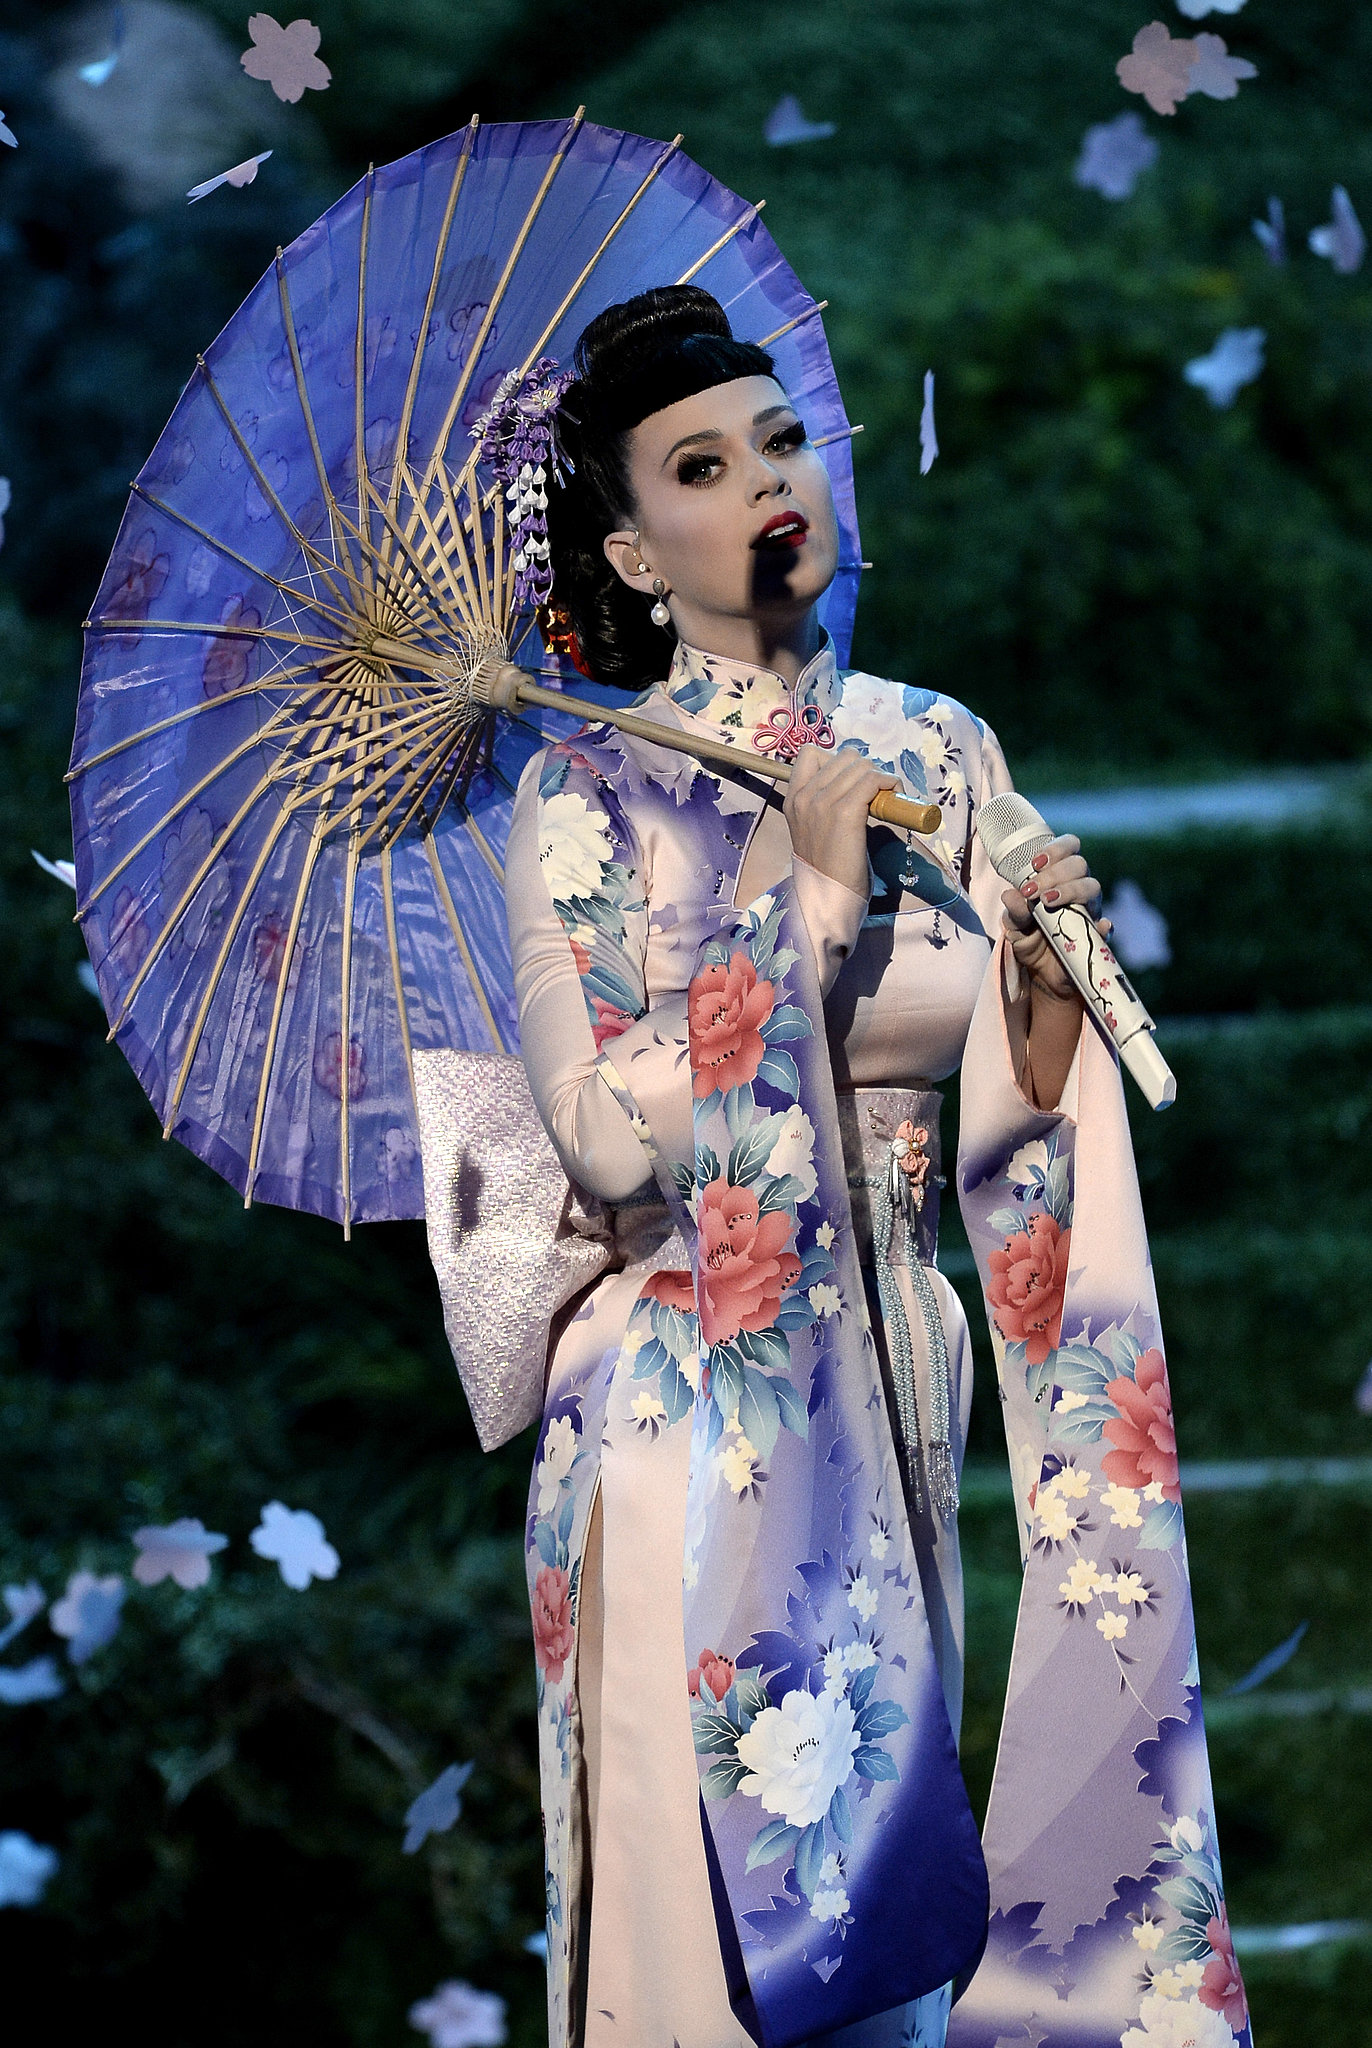 Katy Perry Kicks Off the American Music Awards